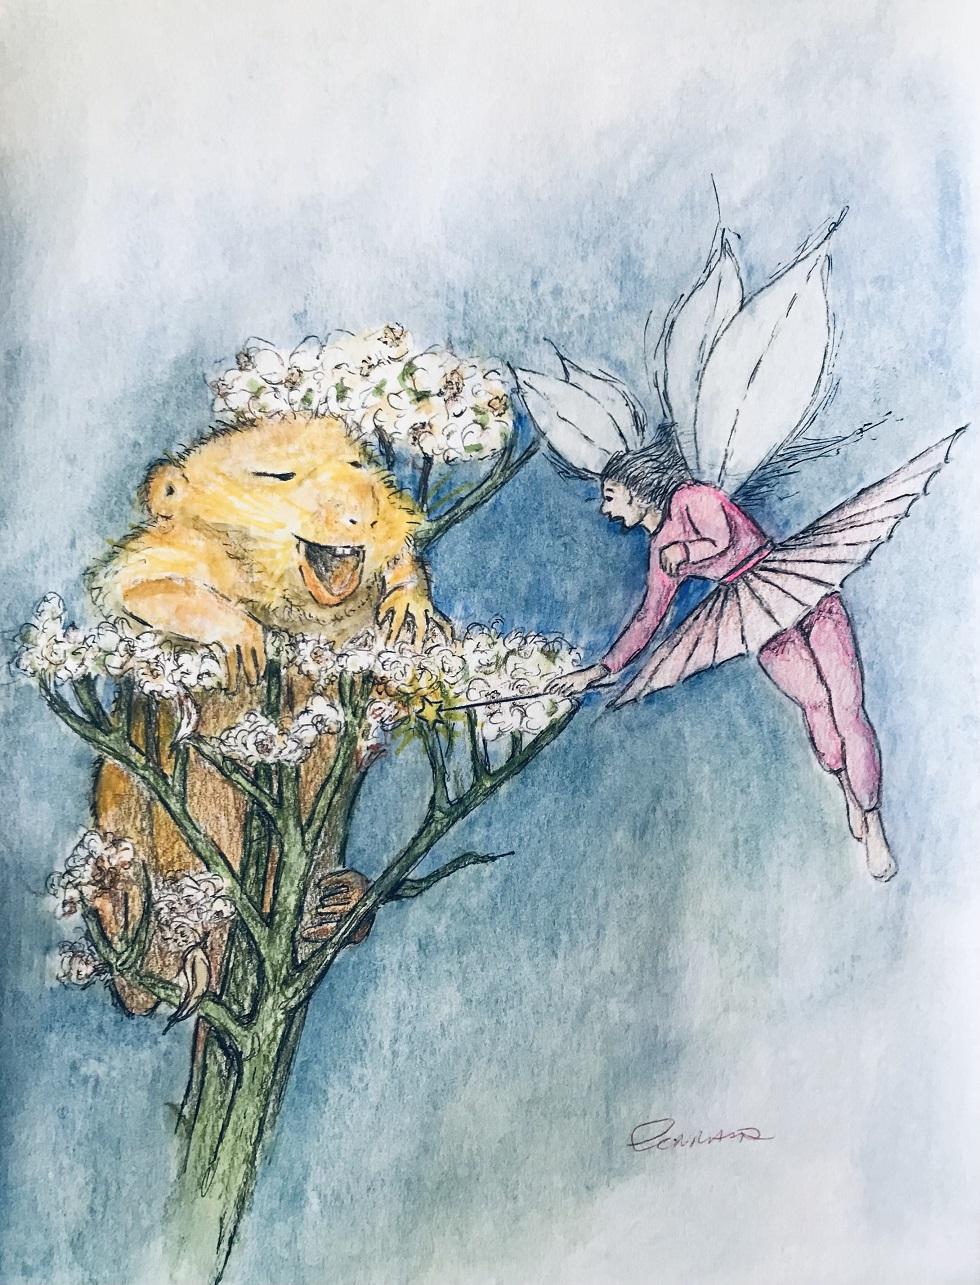 Mouse, Fairy & Lace